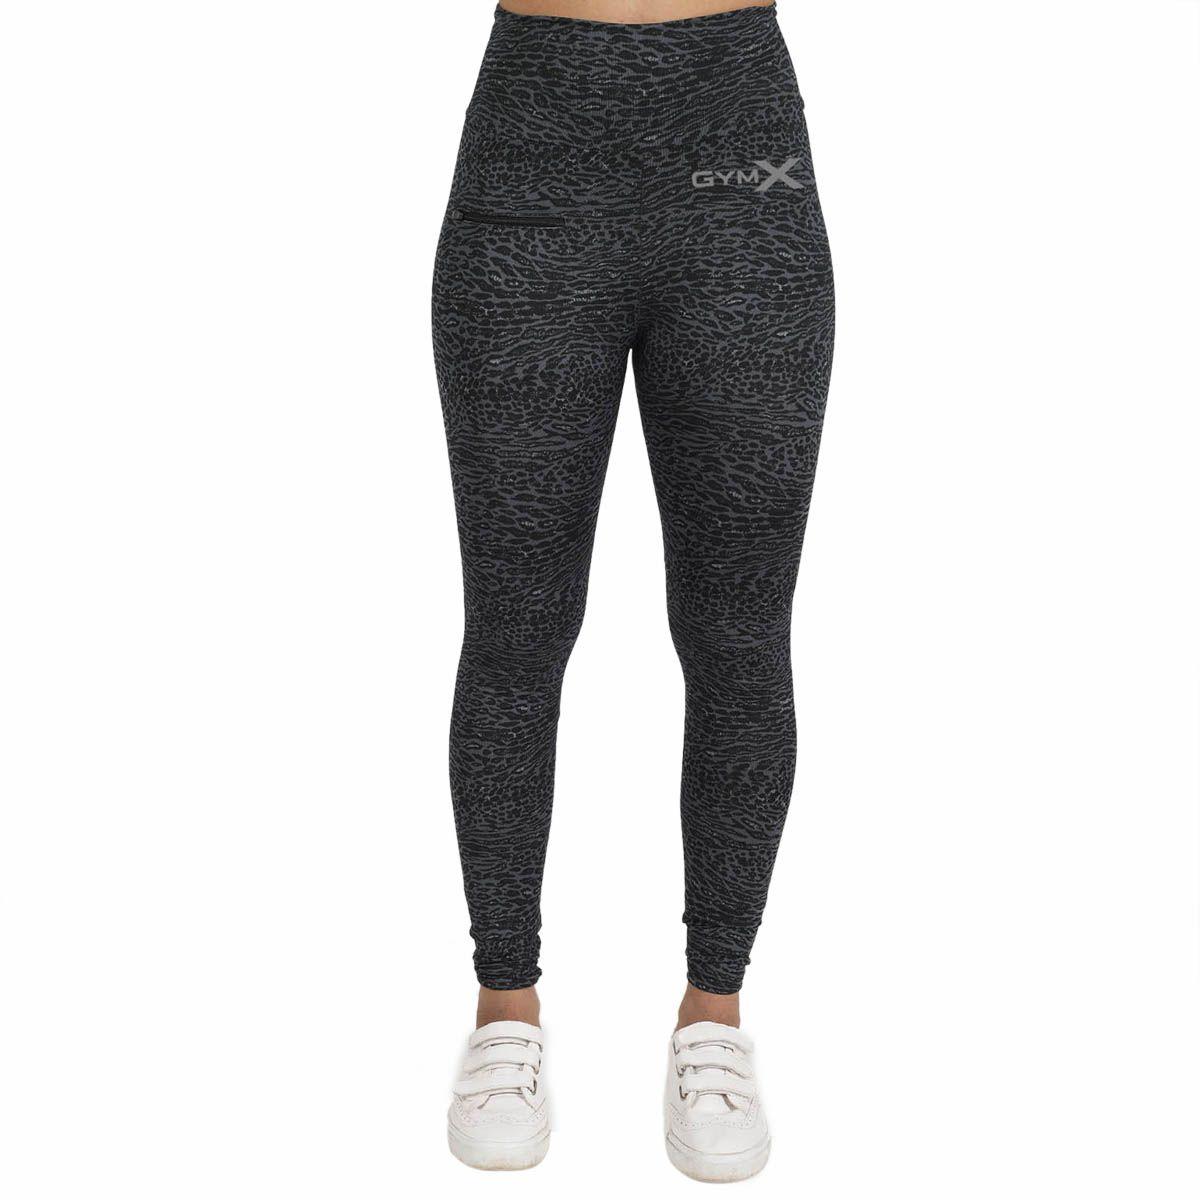 GymX Womens Polyester Allure Leggings: Black Cheetah Skin-Black